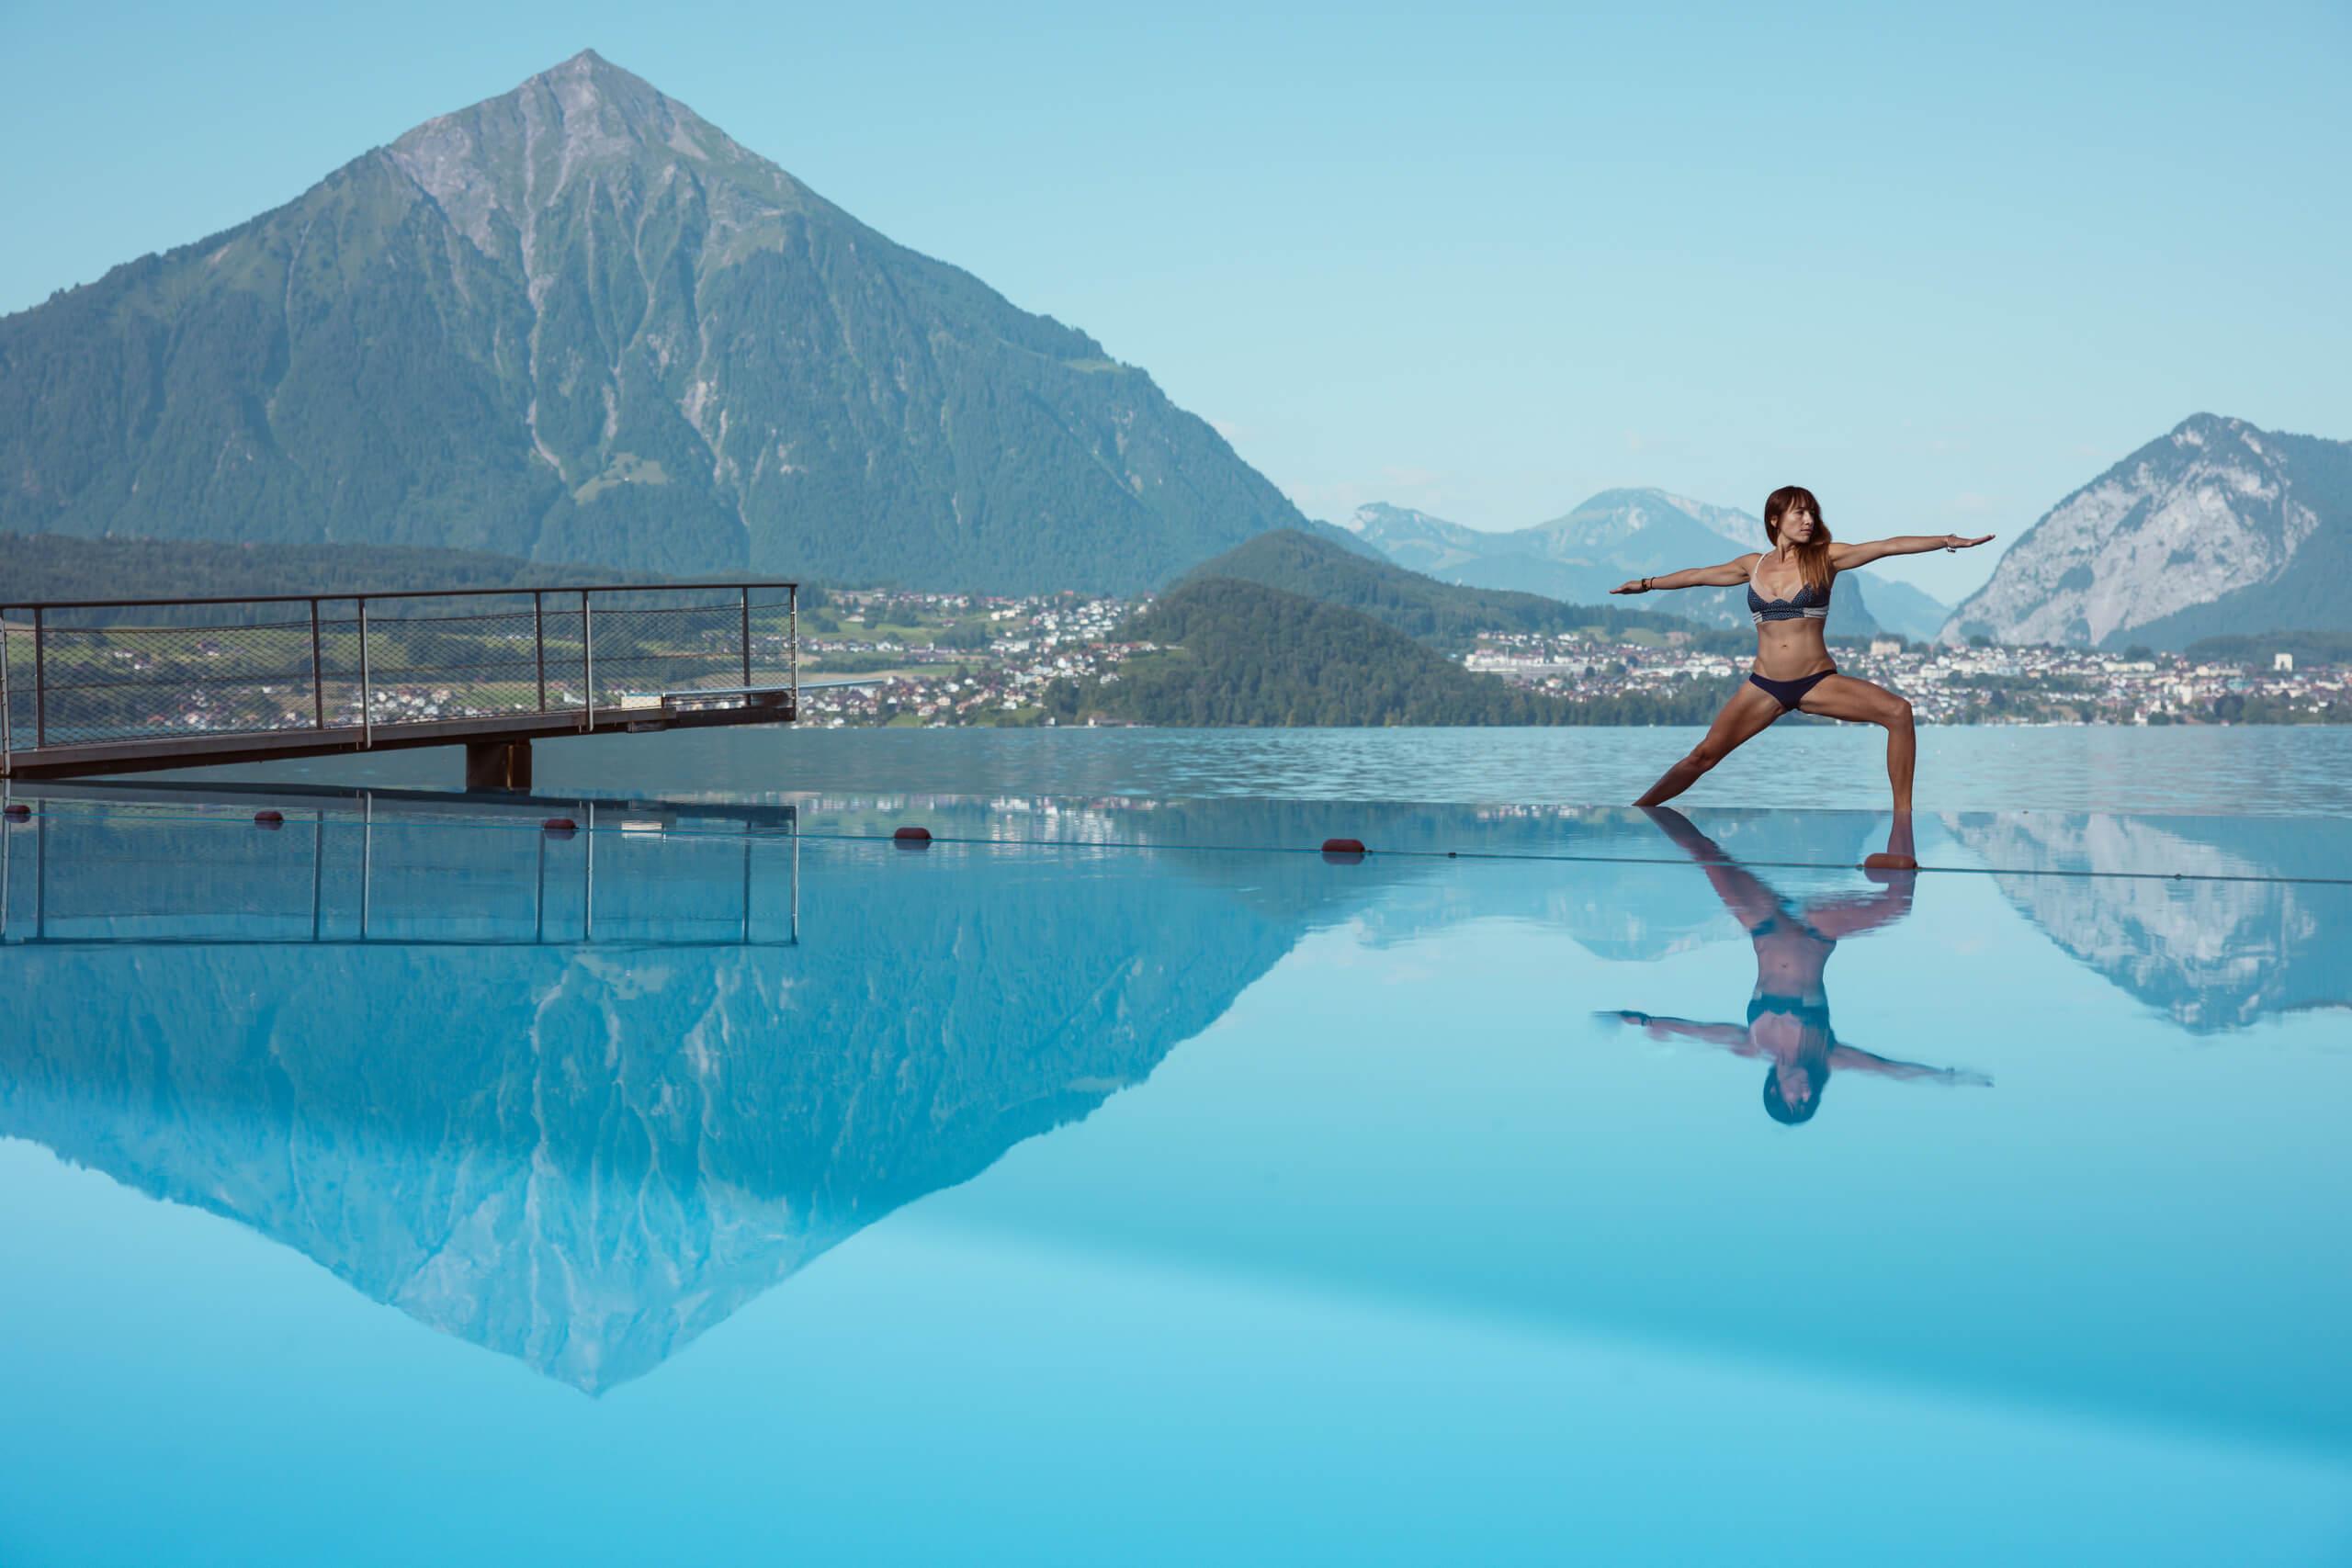 strandbad-merligen-thunersee-sommer-pool-niesen-yoga.jpg